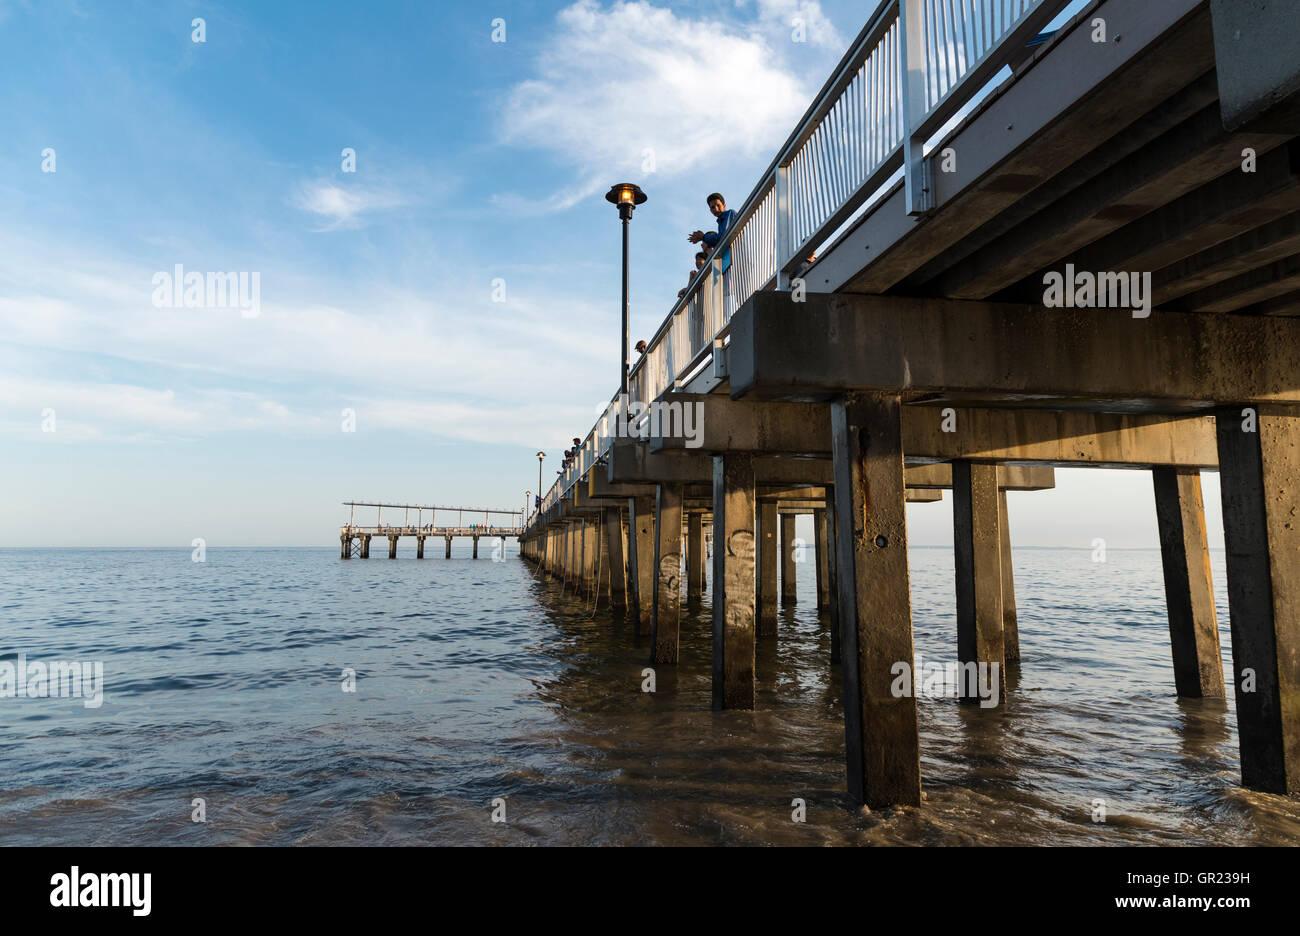 Steeplechase wooden pier on Coney Island beach and boardwalk, New York Stock Photo